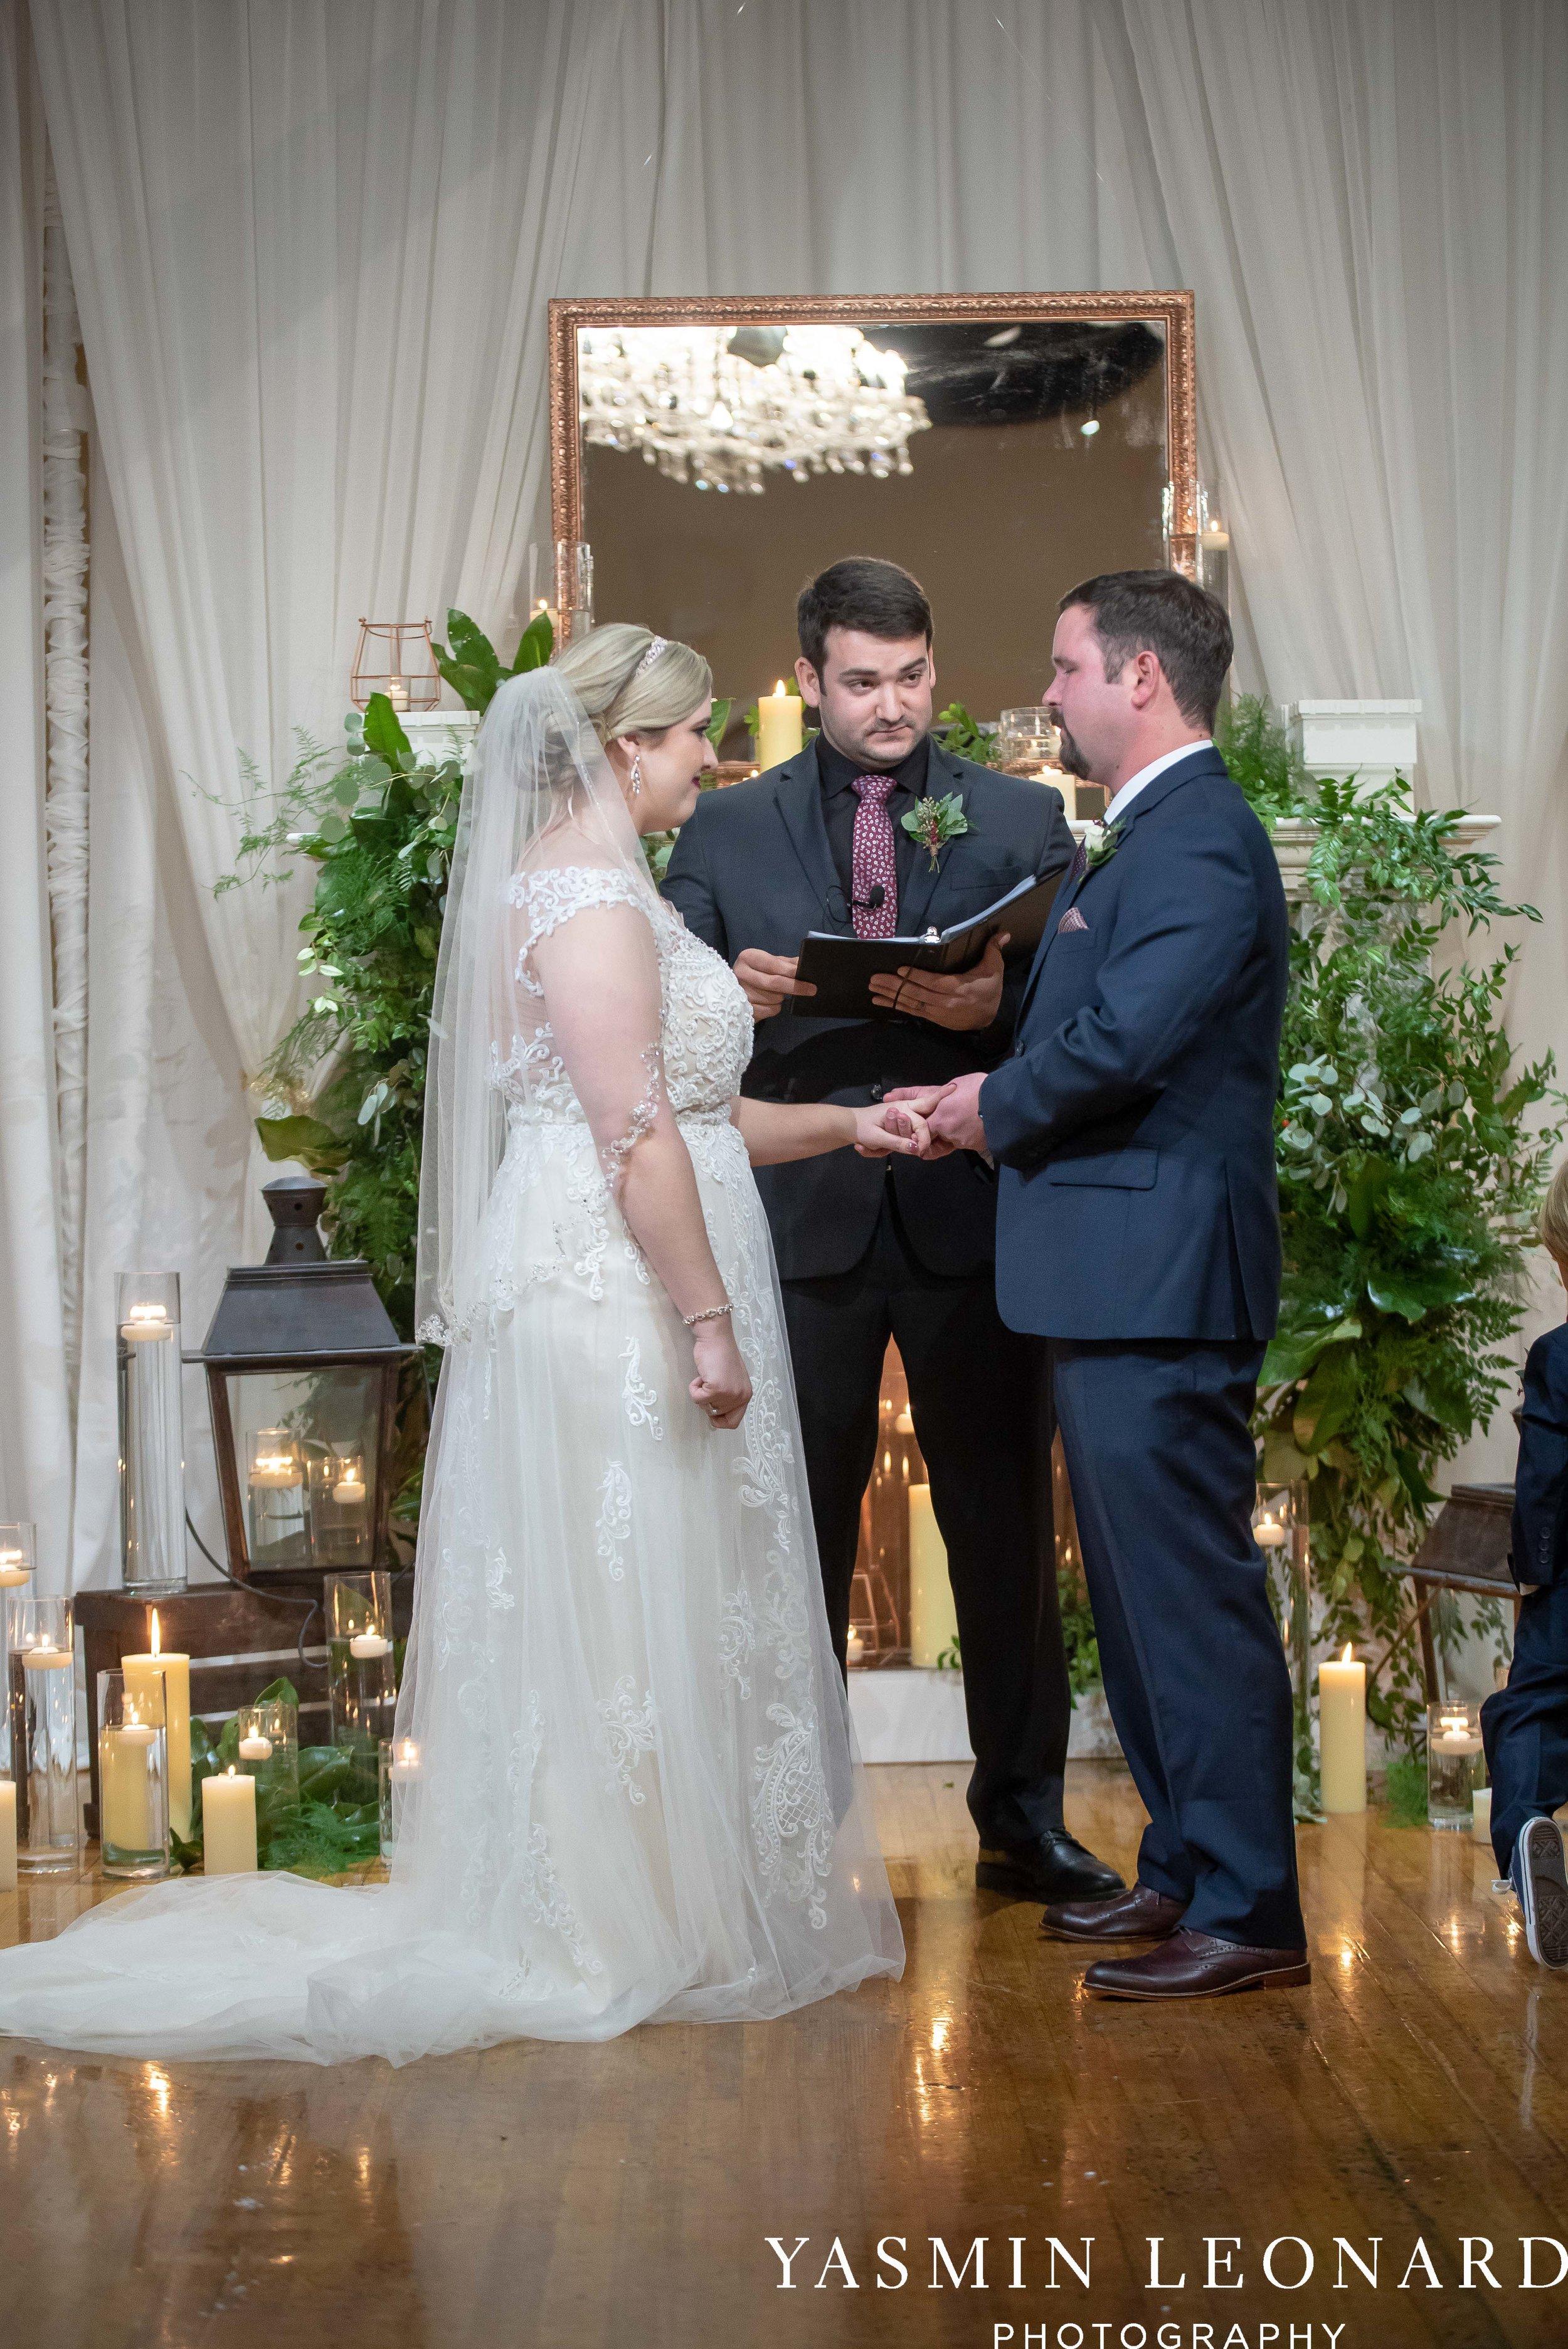 Rebekah and Matt - 105 Worth Event Centre - Yasmin Leonard Photography - Asheboro Wedding - NC Wedding - High Point Weddings - Triad Weddings - Winter Wedding-26.jpg